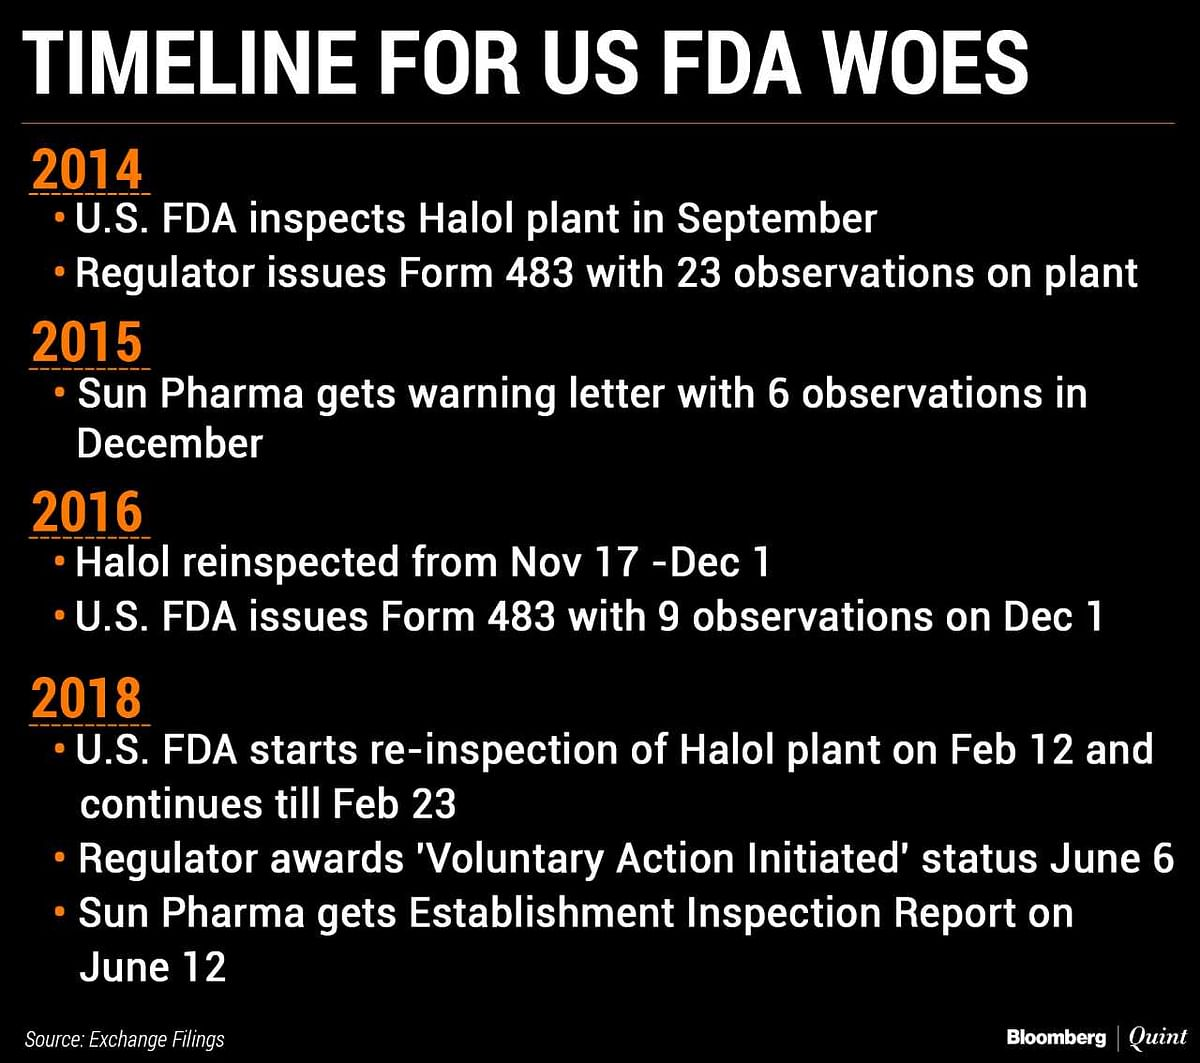 U.S. Drug Regulator Clears Sun Pharma's Halol Plant